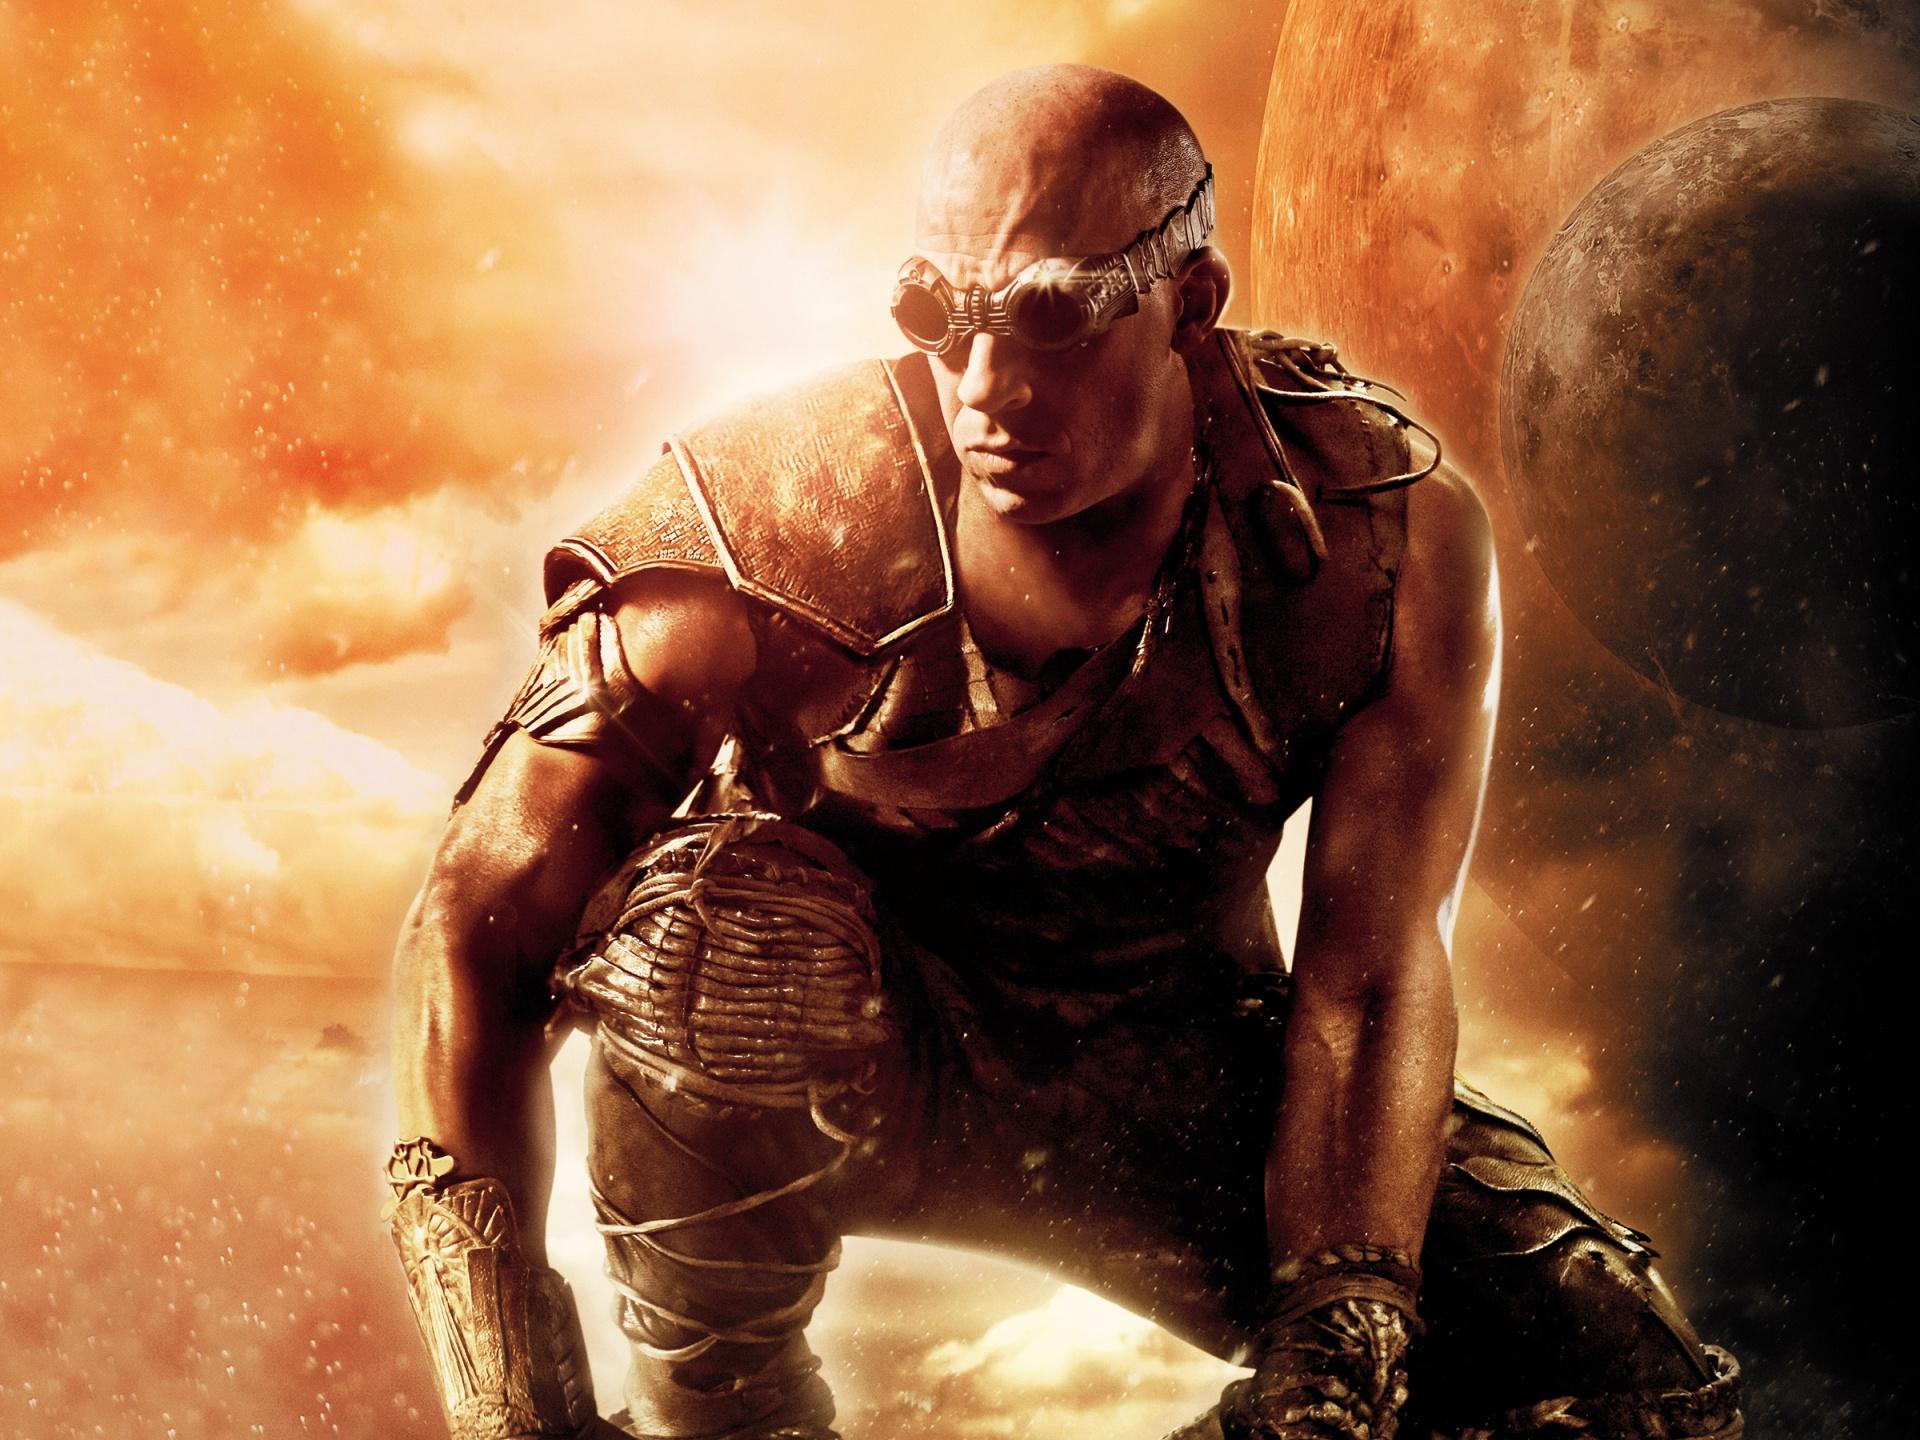 Riddick 3 - Vin Diesel as Riddick